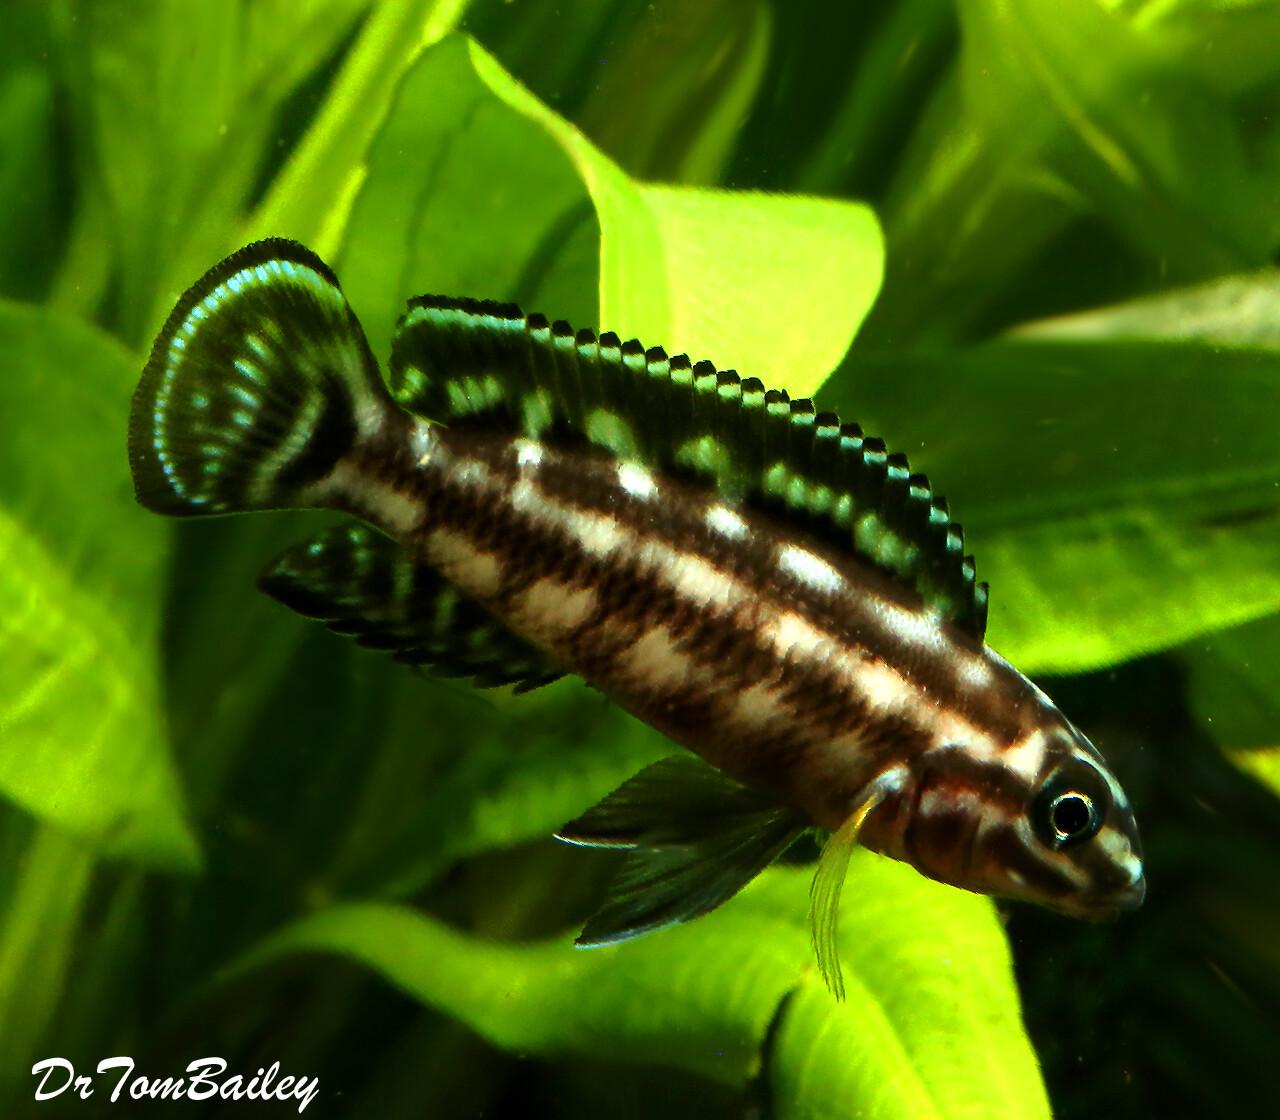 "Premium Lake Tanganyika Plaid Juli Cichlid, Julidochromis marlieri, 1.5"" to 2"" long"